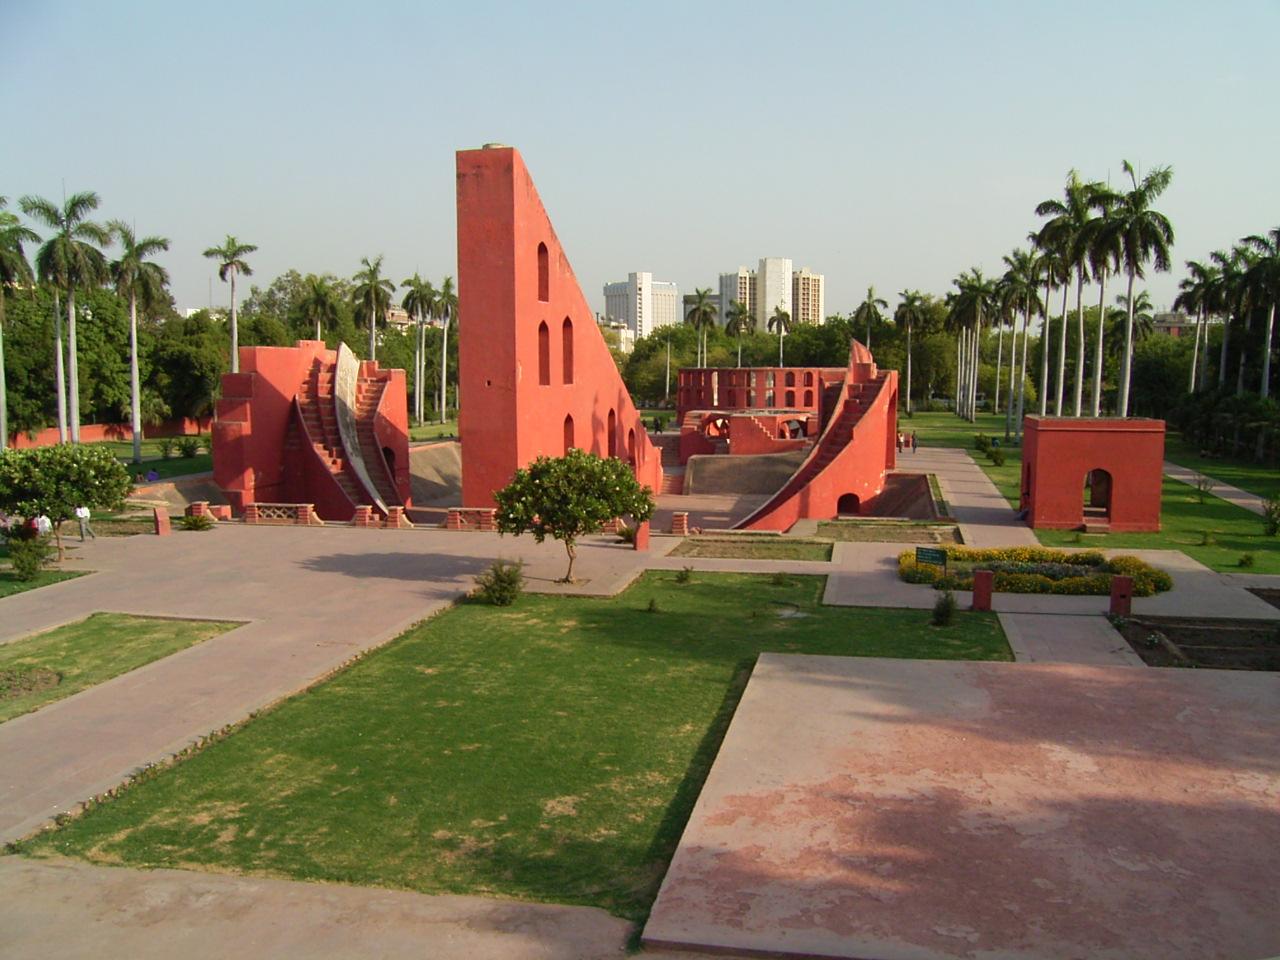 http://upload.wikimedia.org/wikipedia/commons/a/aa/Jantar_Mantar_Delhi_27-05-2005.jpg